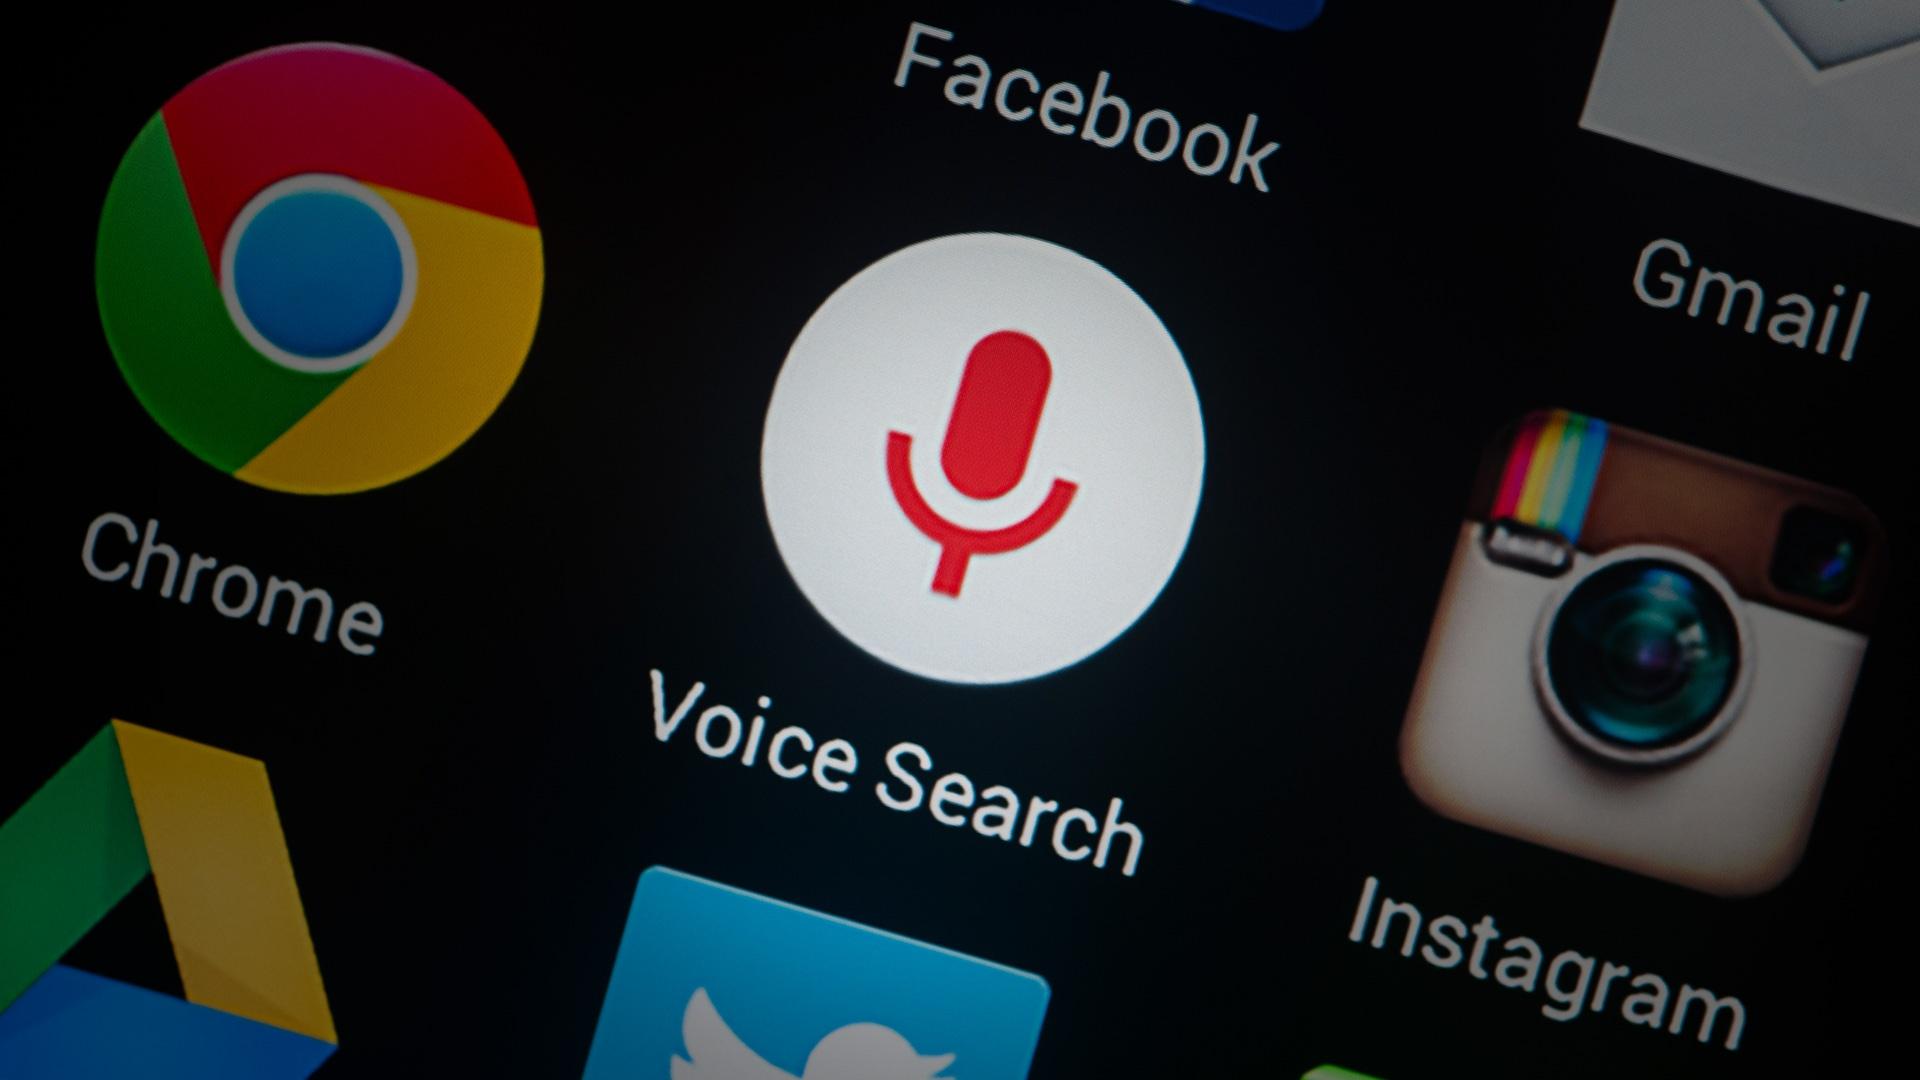 voice-search-app.jpg